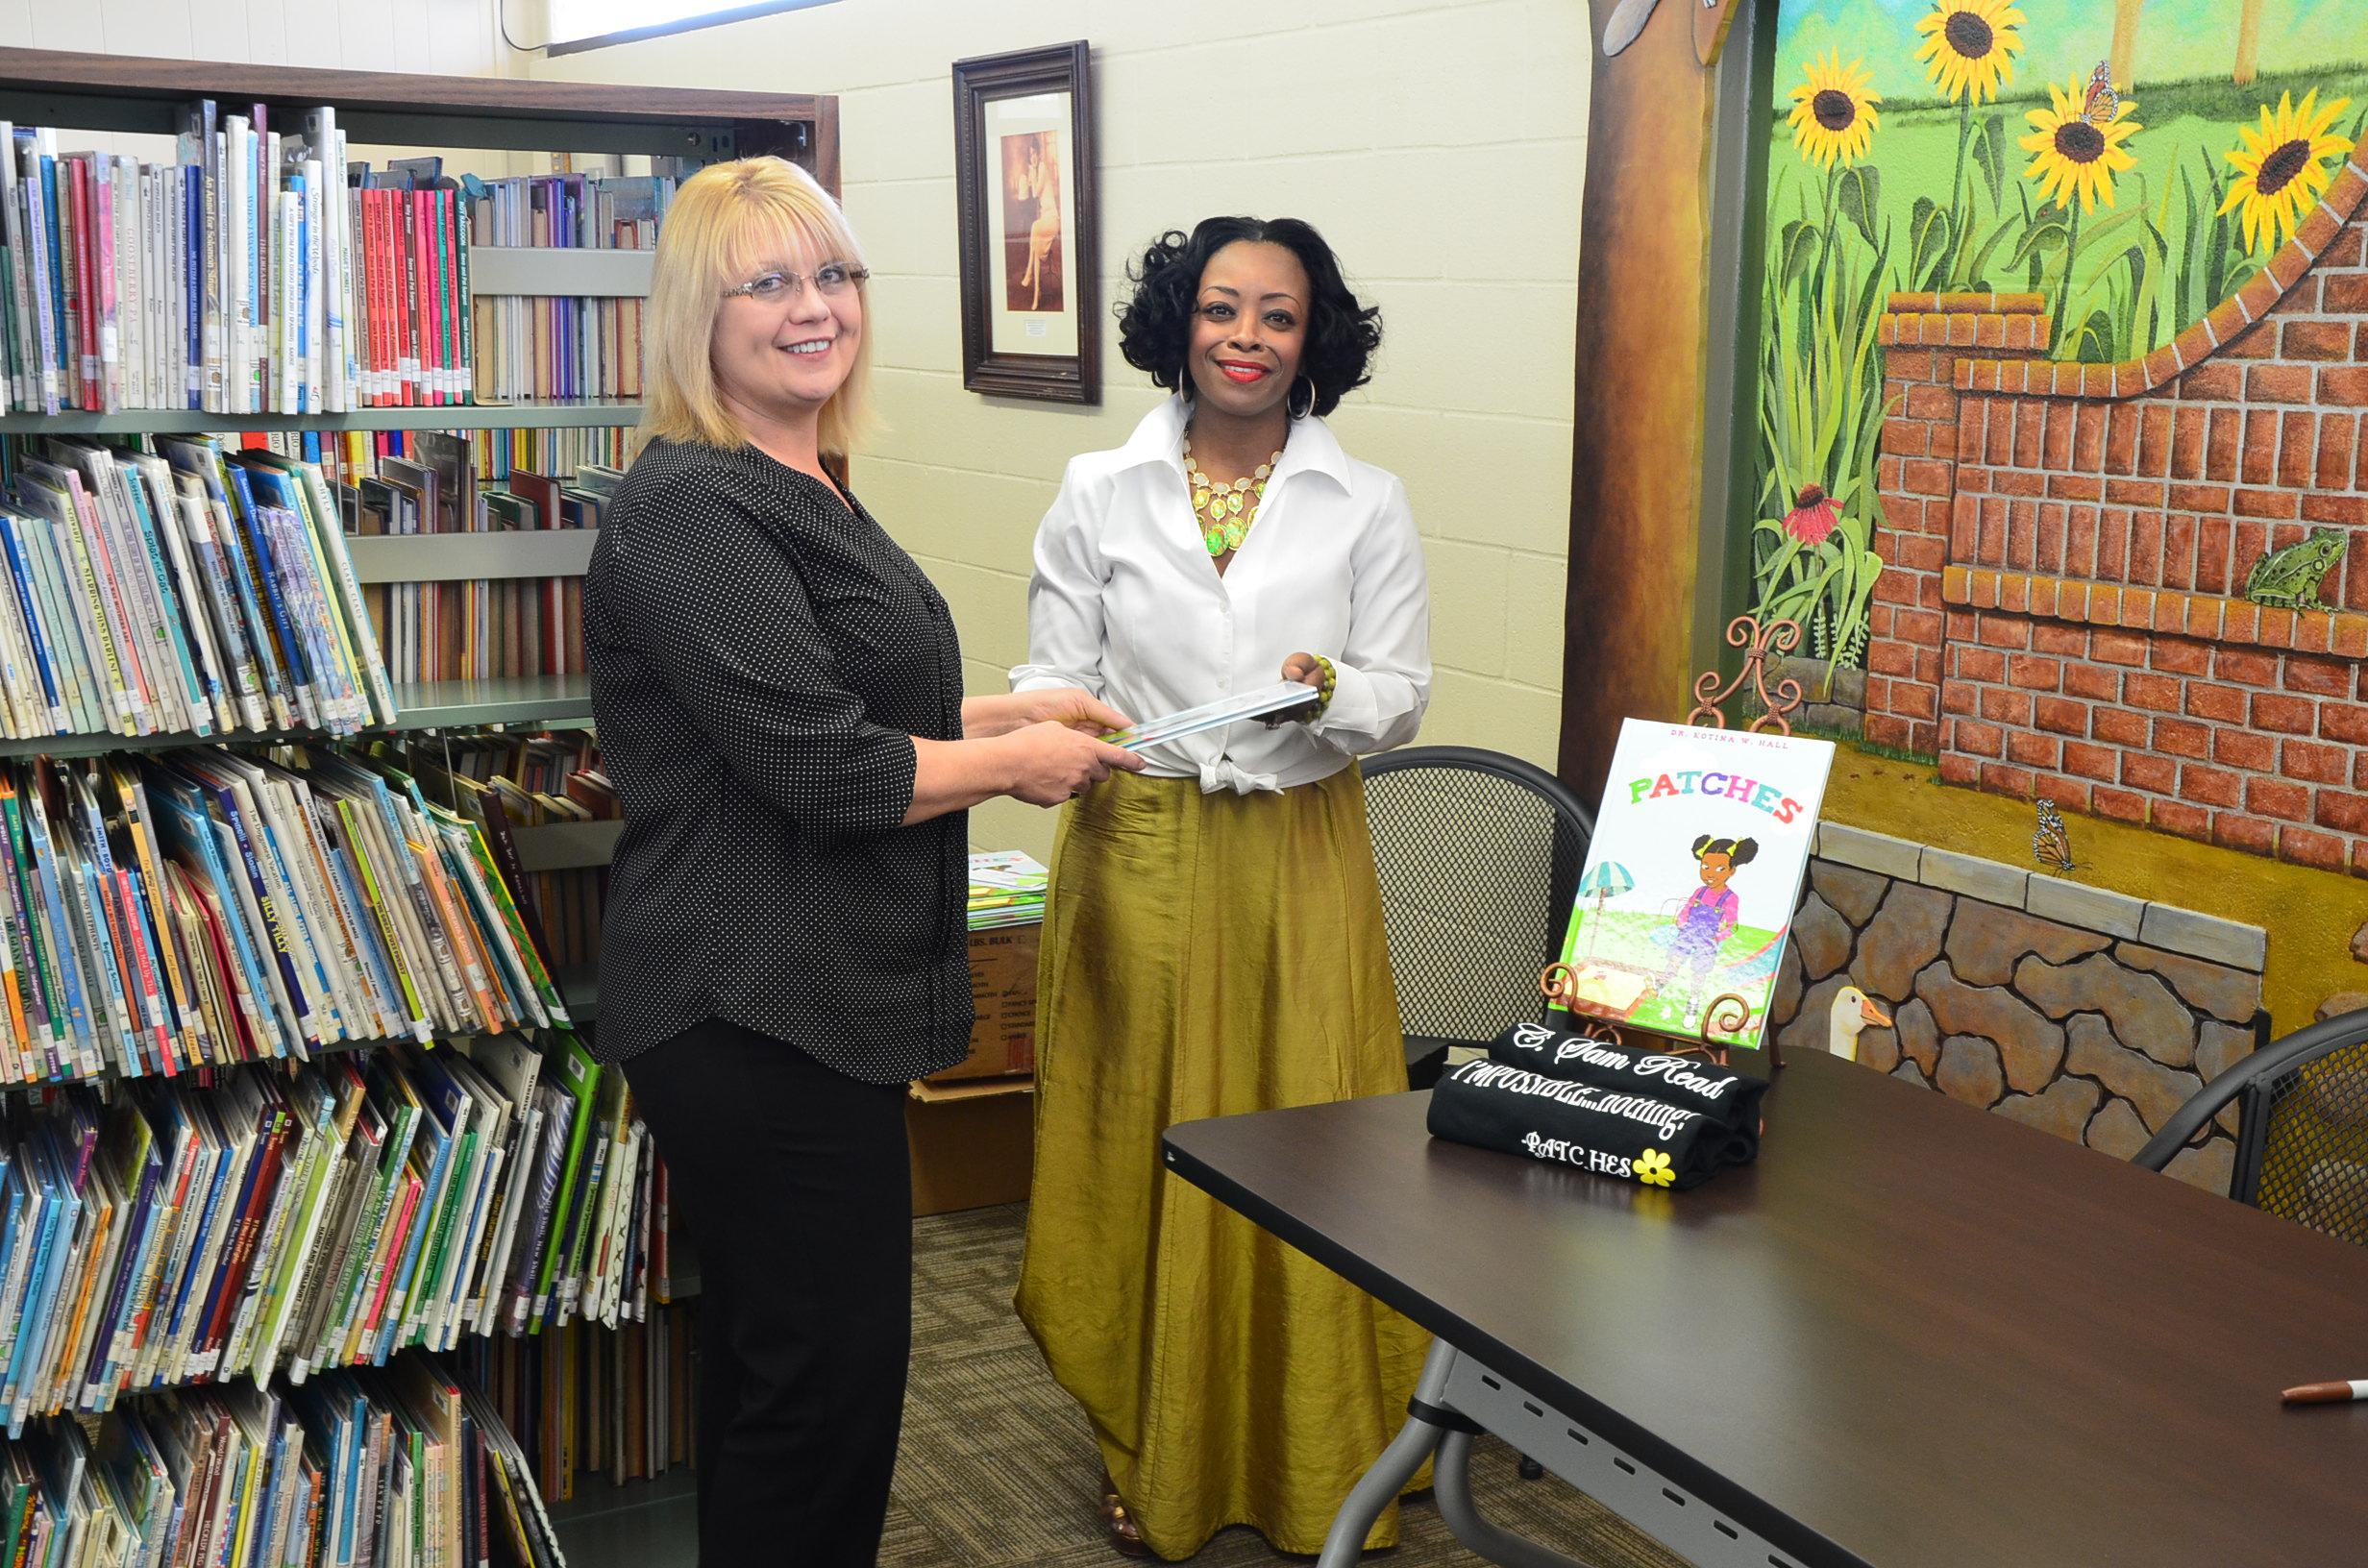 Librarian appriciates C. Sam Read